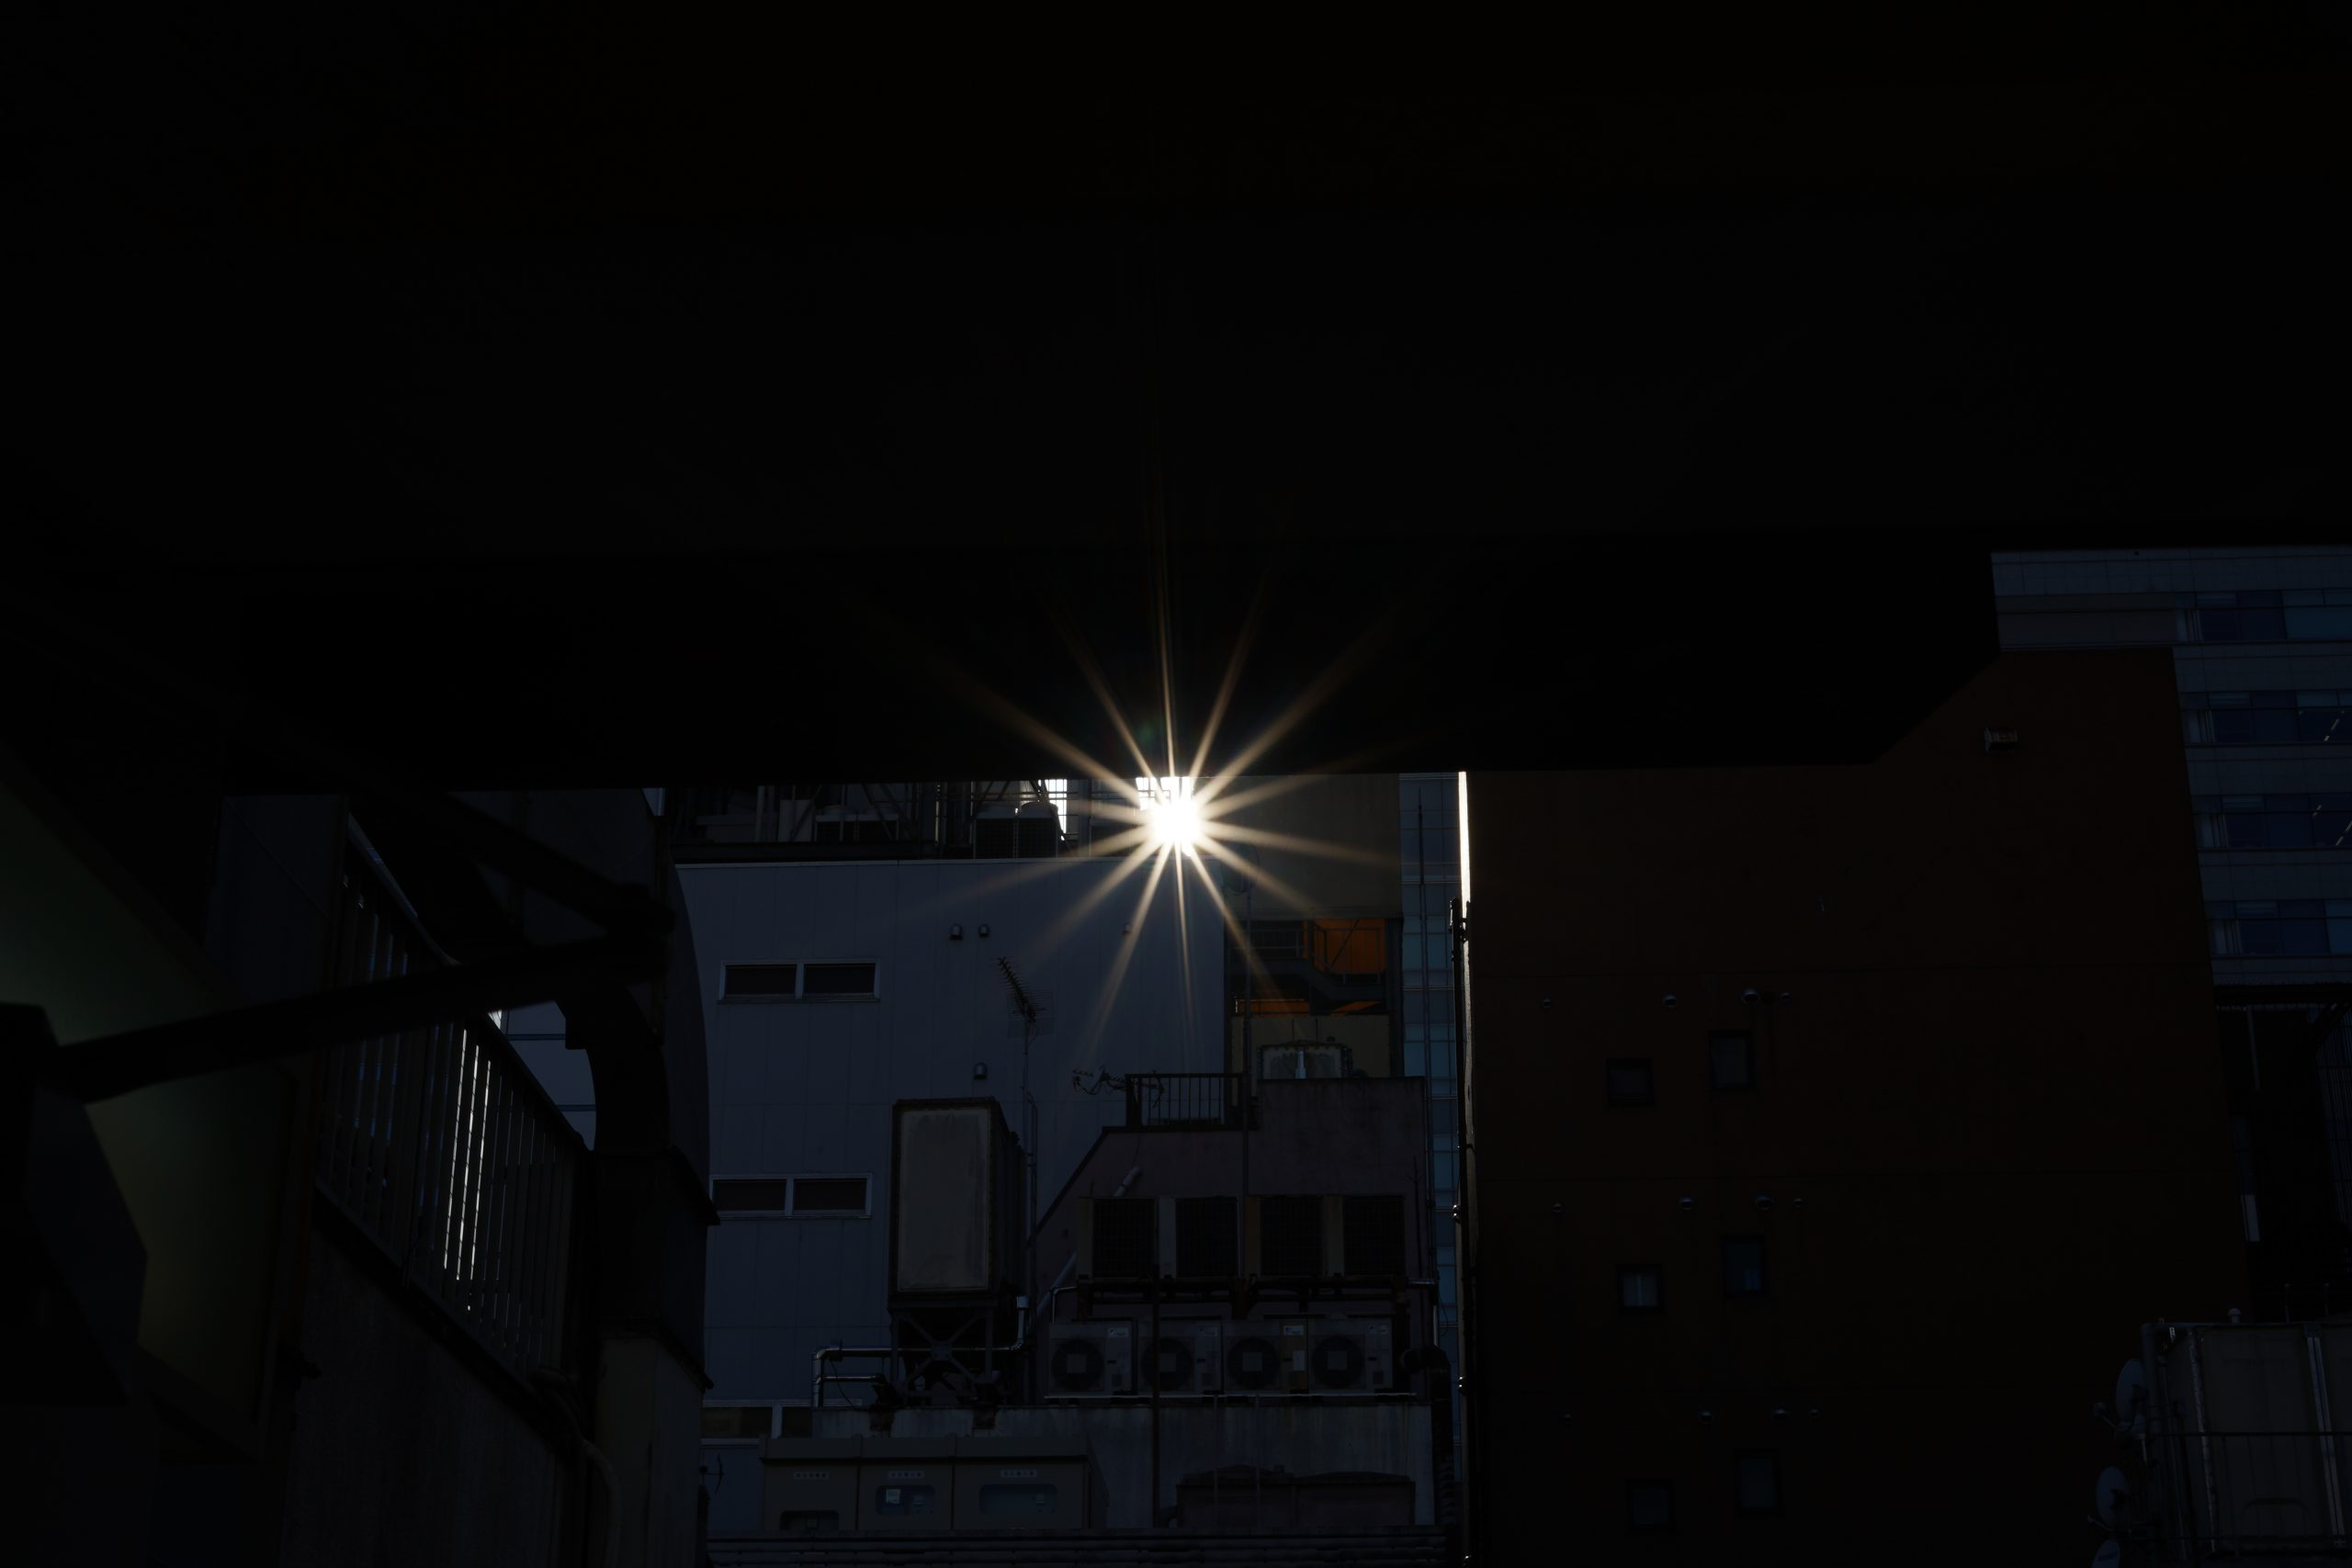 【SONY】光芒と絞り羽根